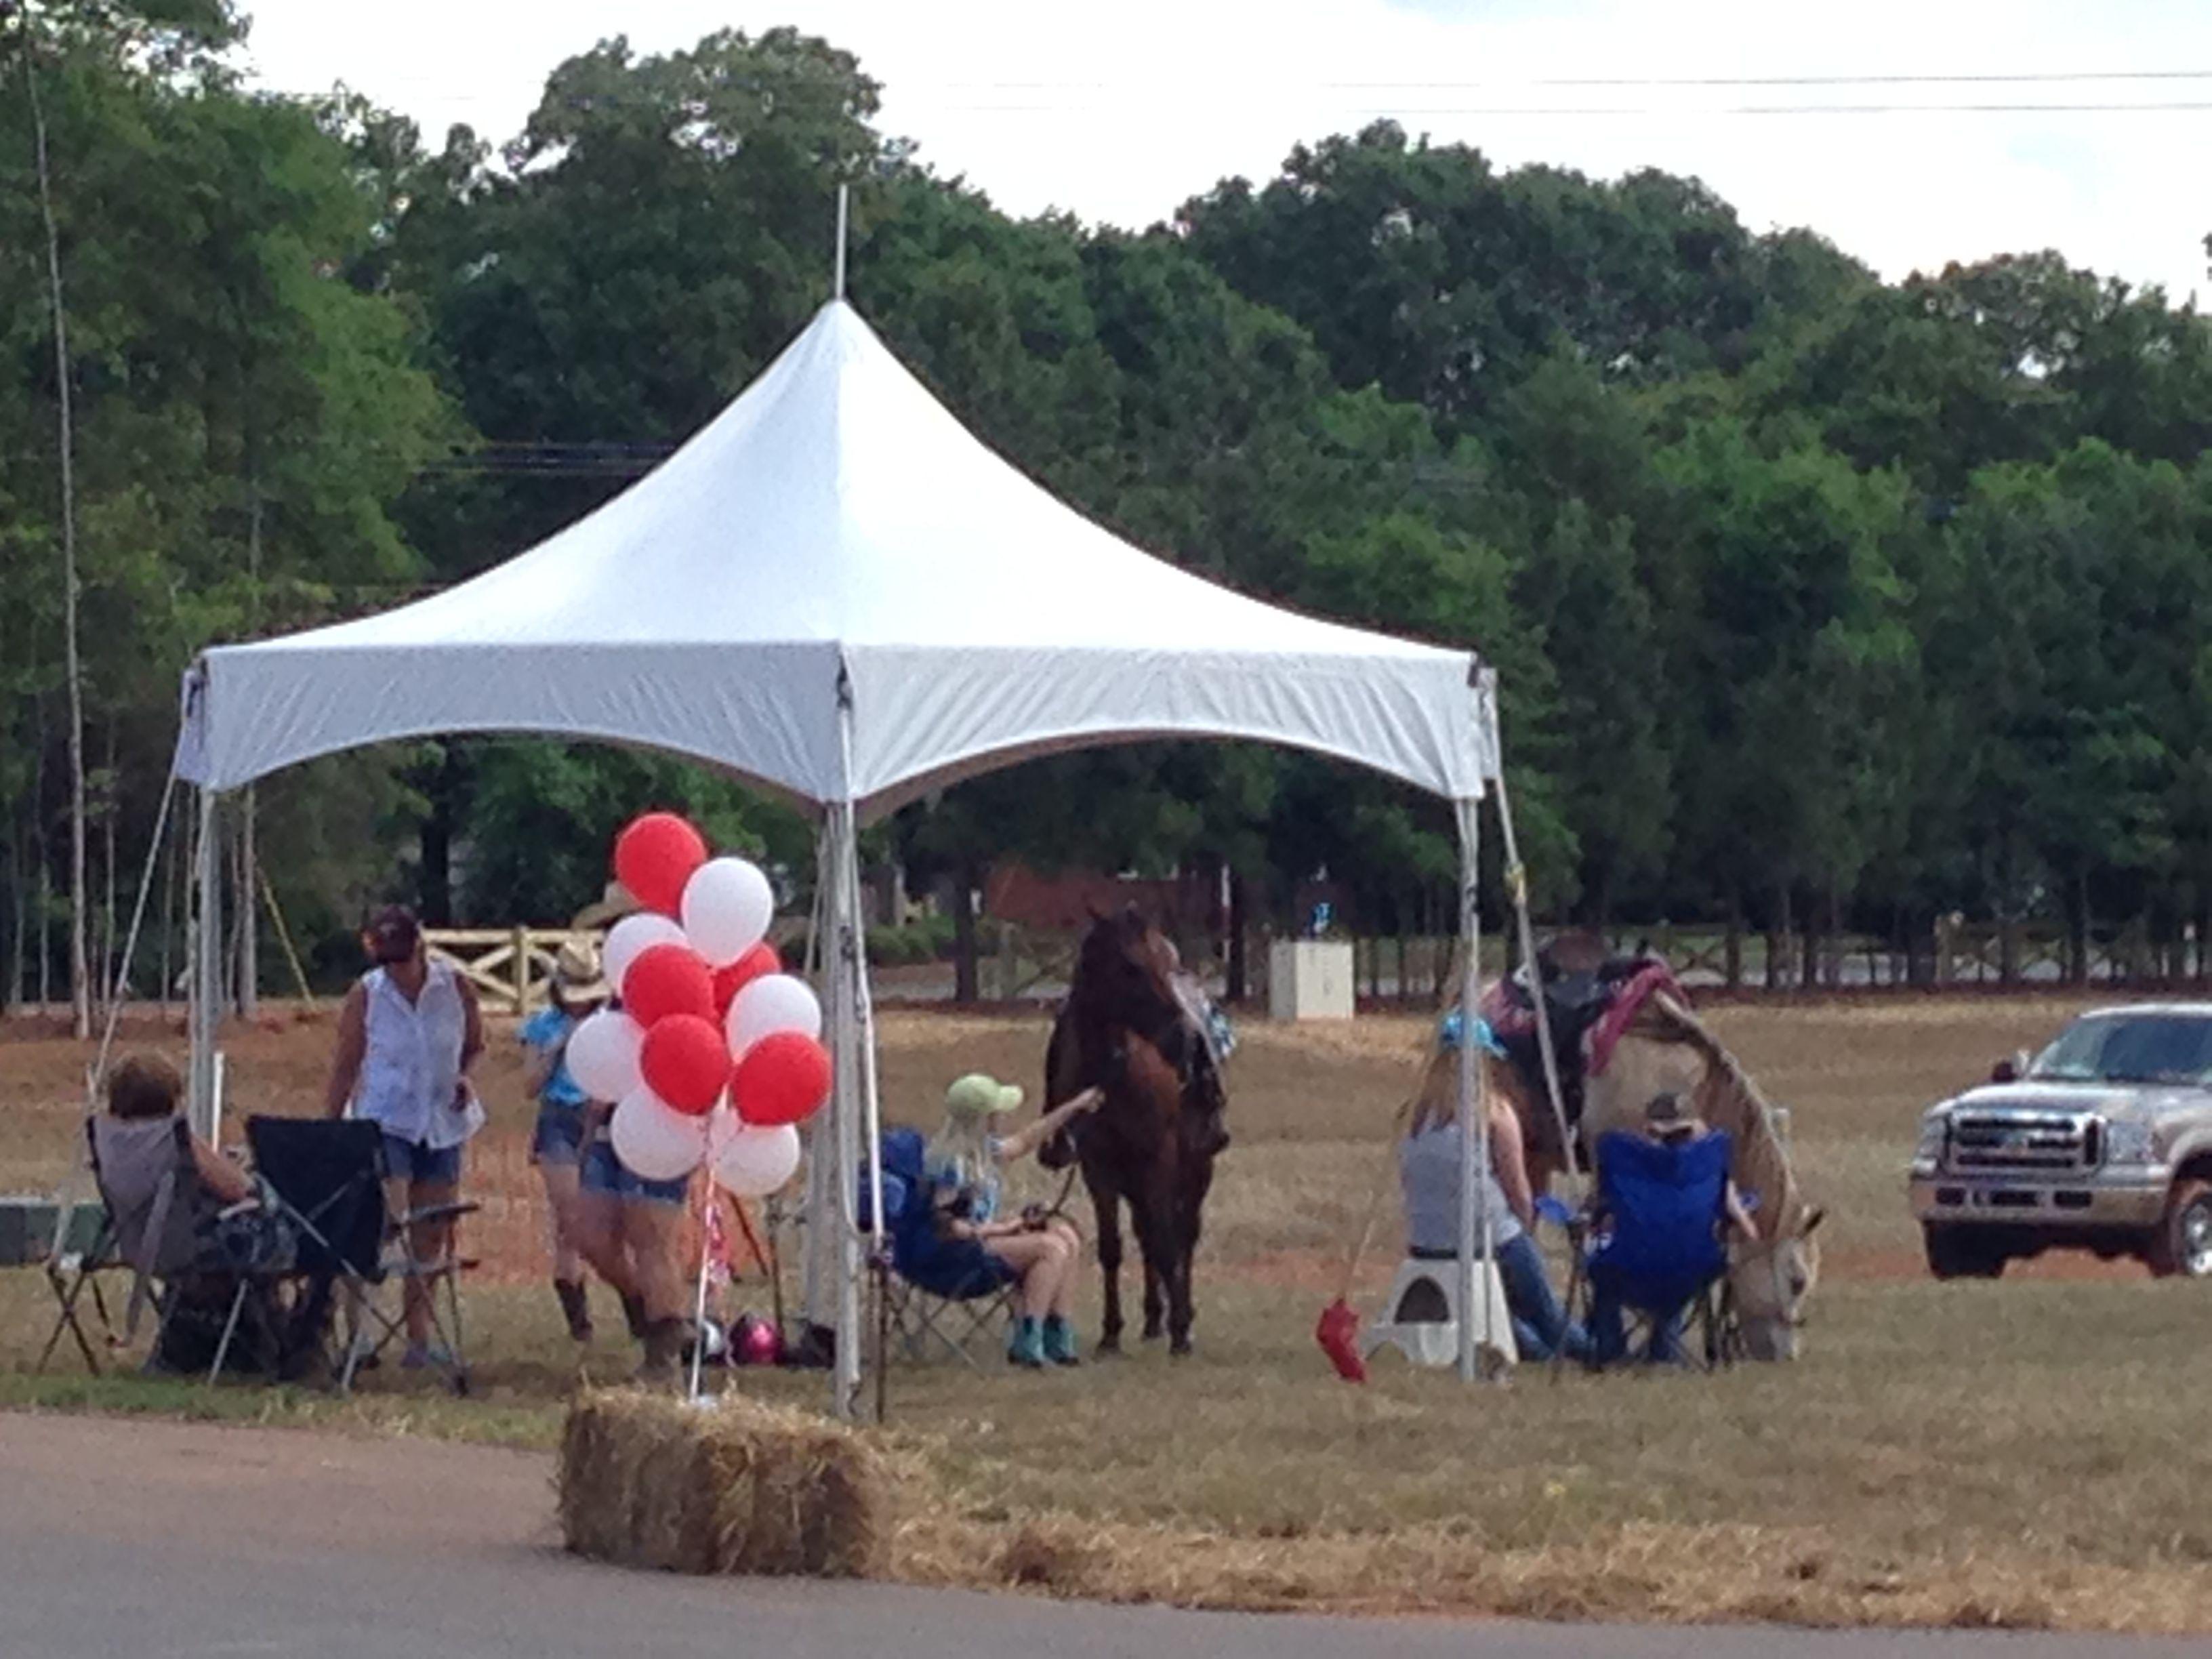 Community Grand Opening at #Morgan'sBranch in #Belmont, NC